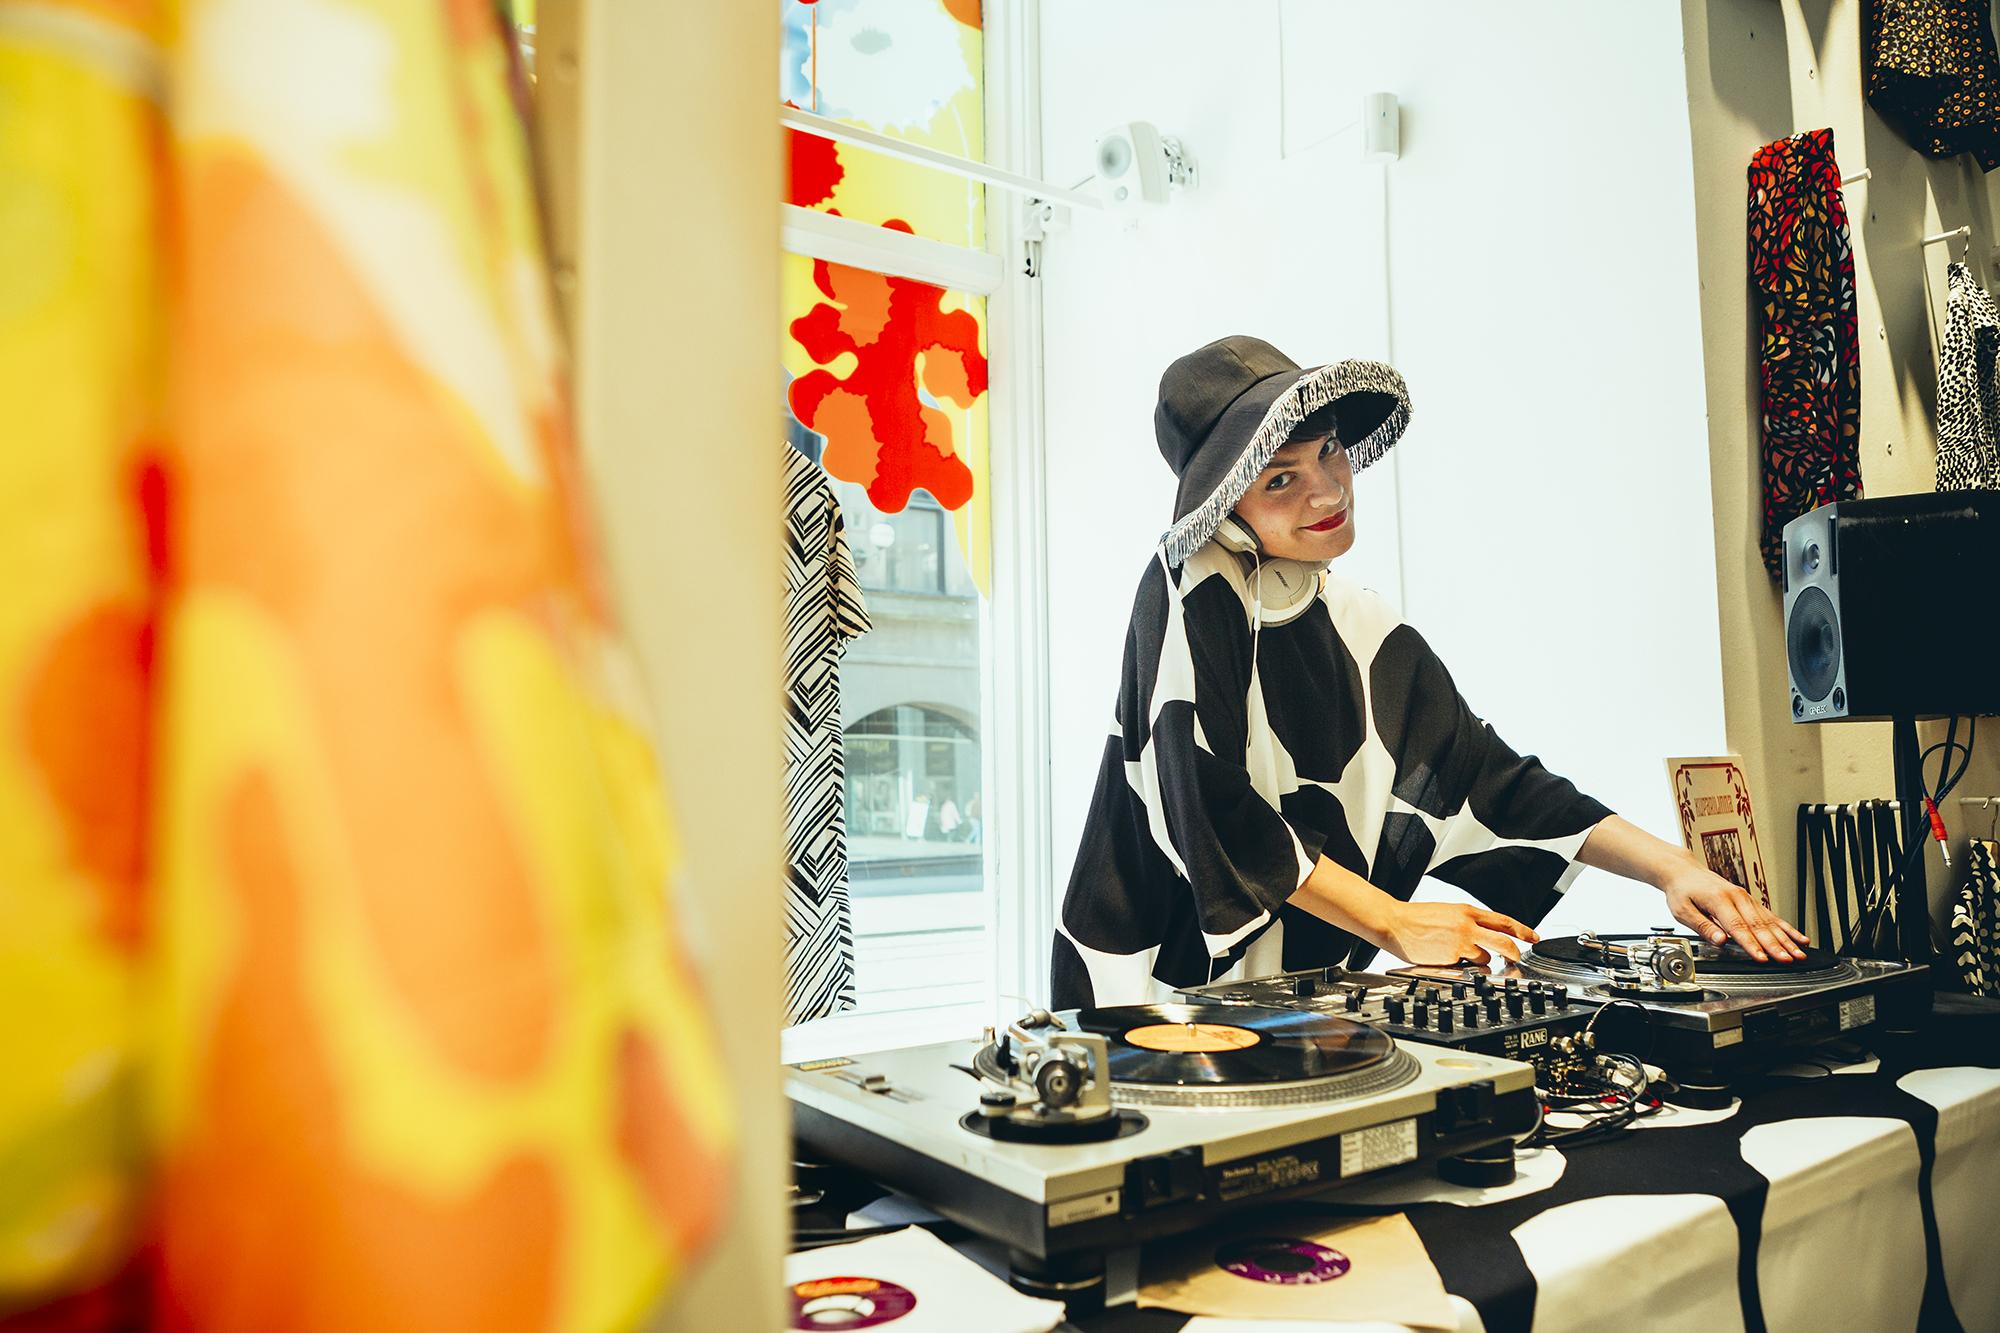 Toimi Tytti Playing at Marimekko store